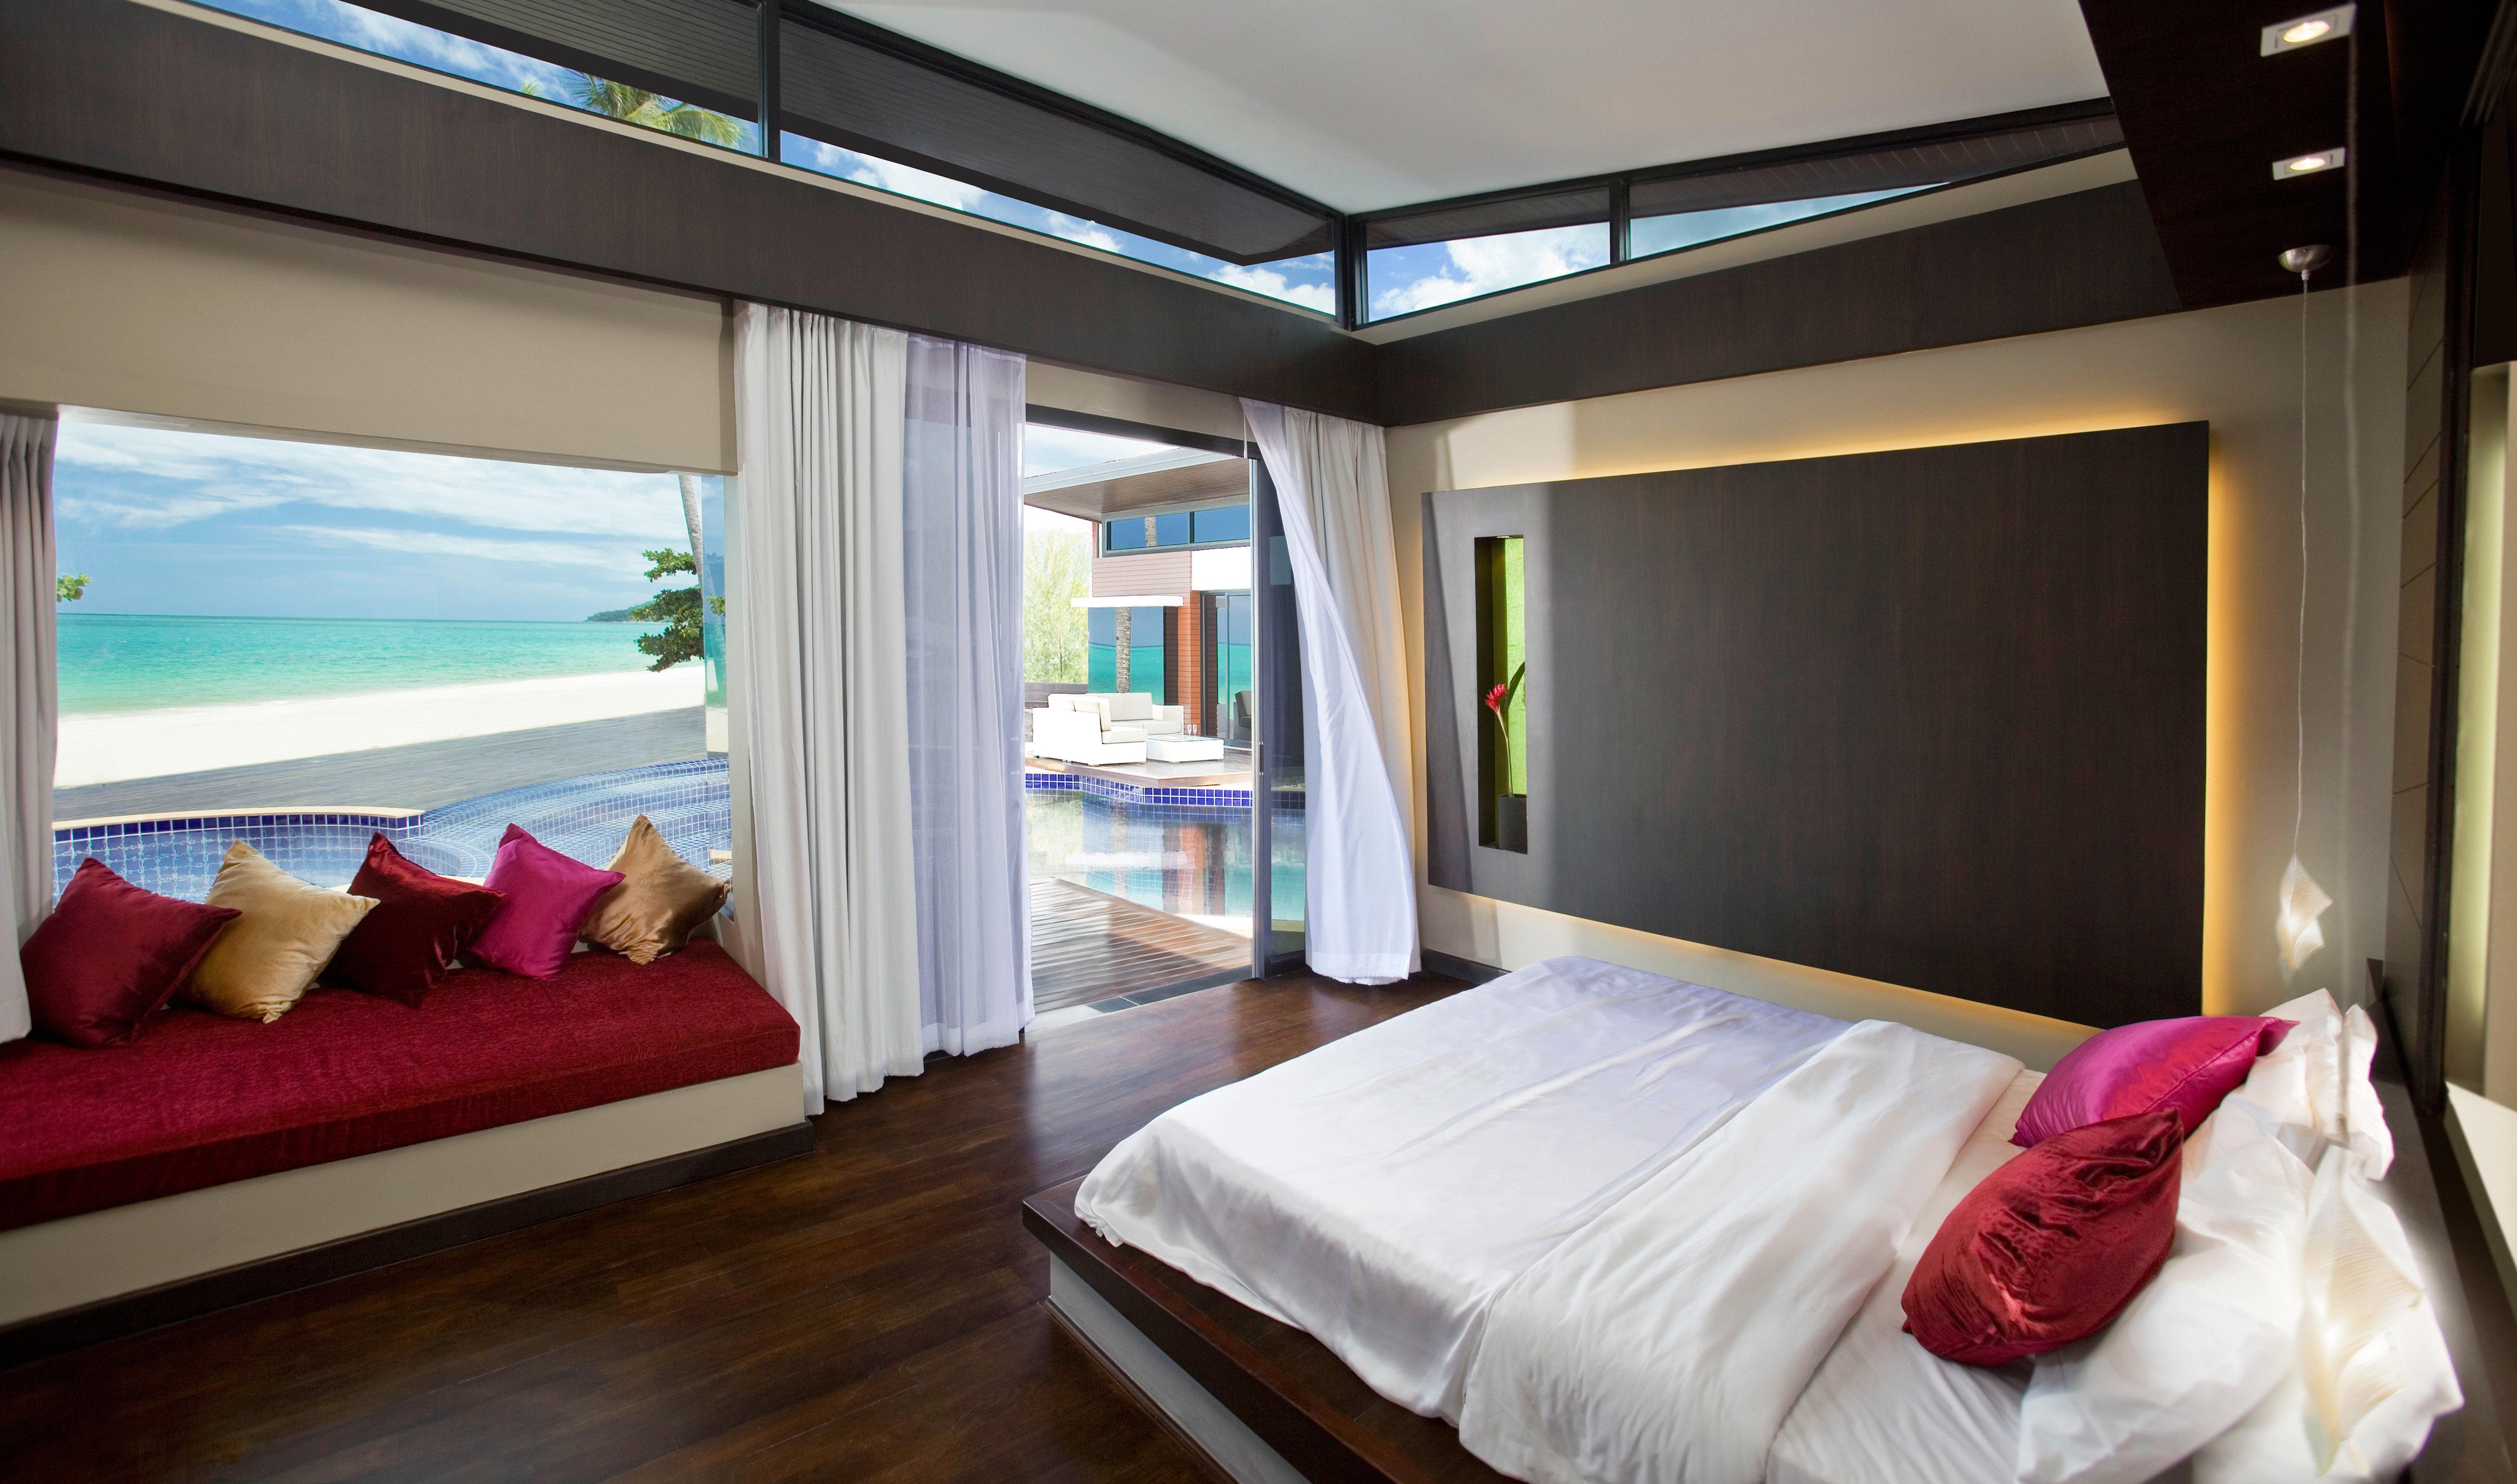 Bedroom Elegant Hip Luxury Modern Scenic views Suite property home Resort condominium living room cottage